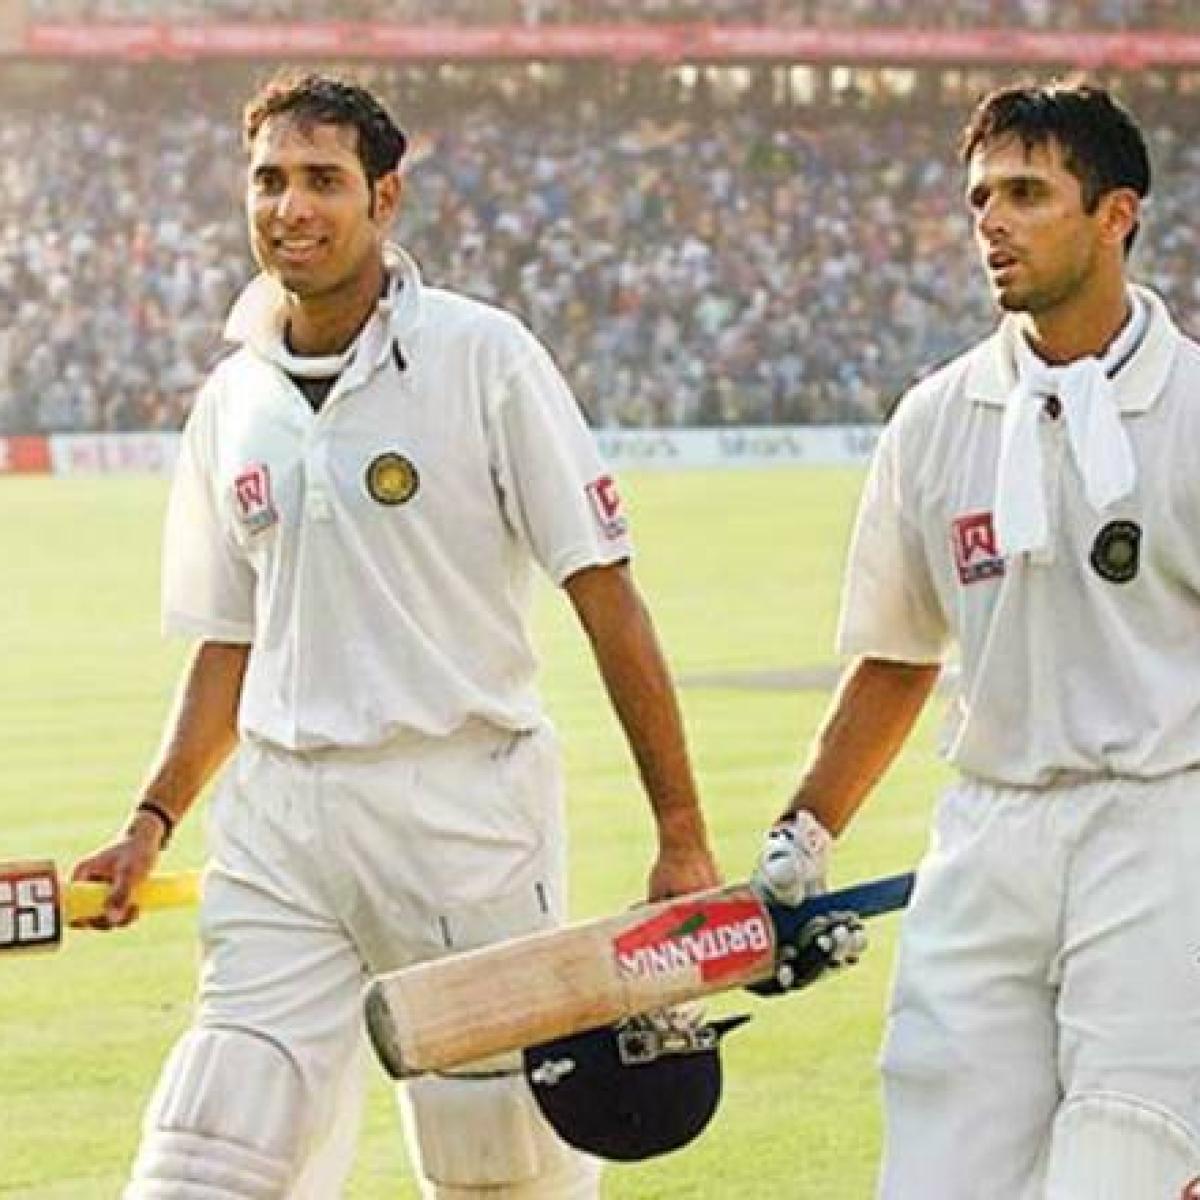 PIB uses Dravid-Laxman's epic innings to urge resolve against coronavirus